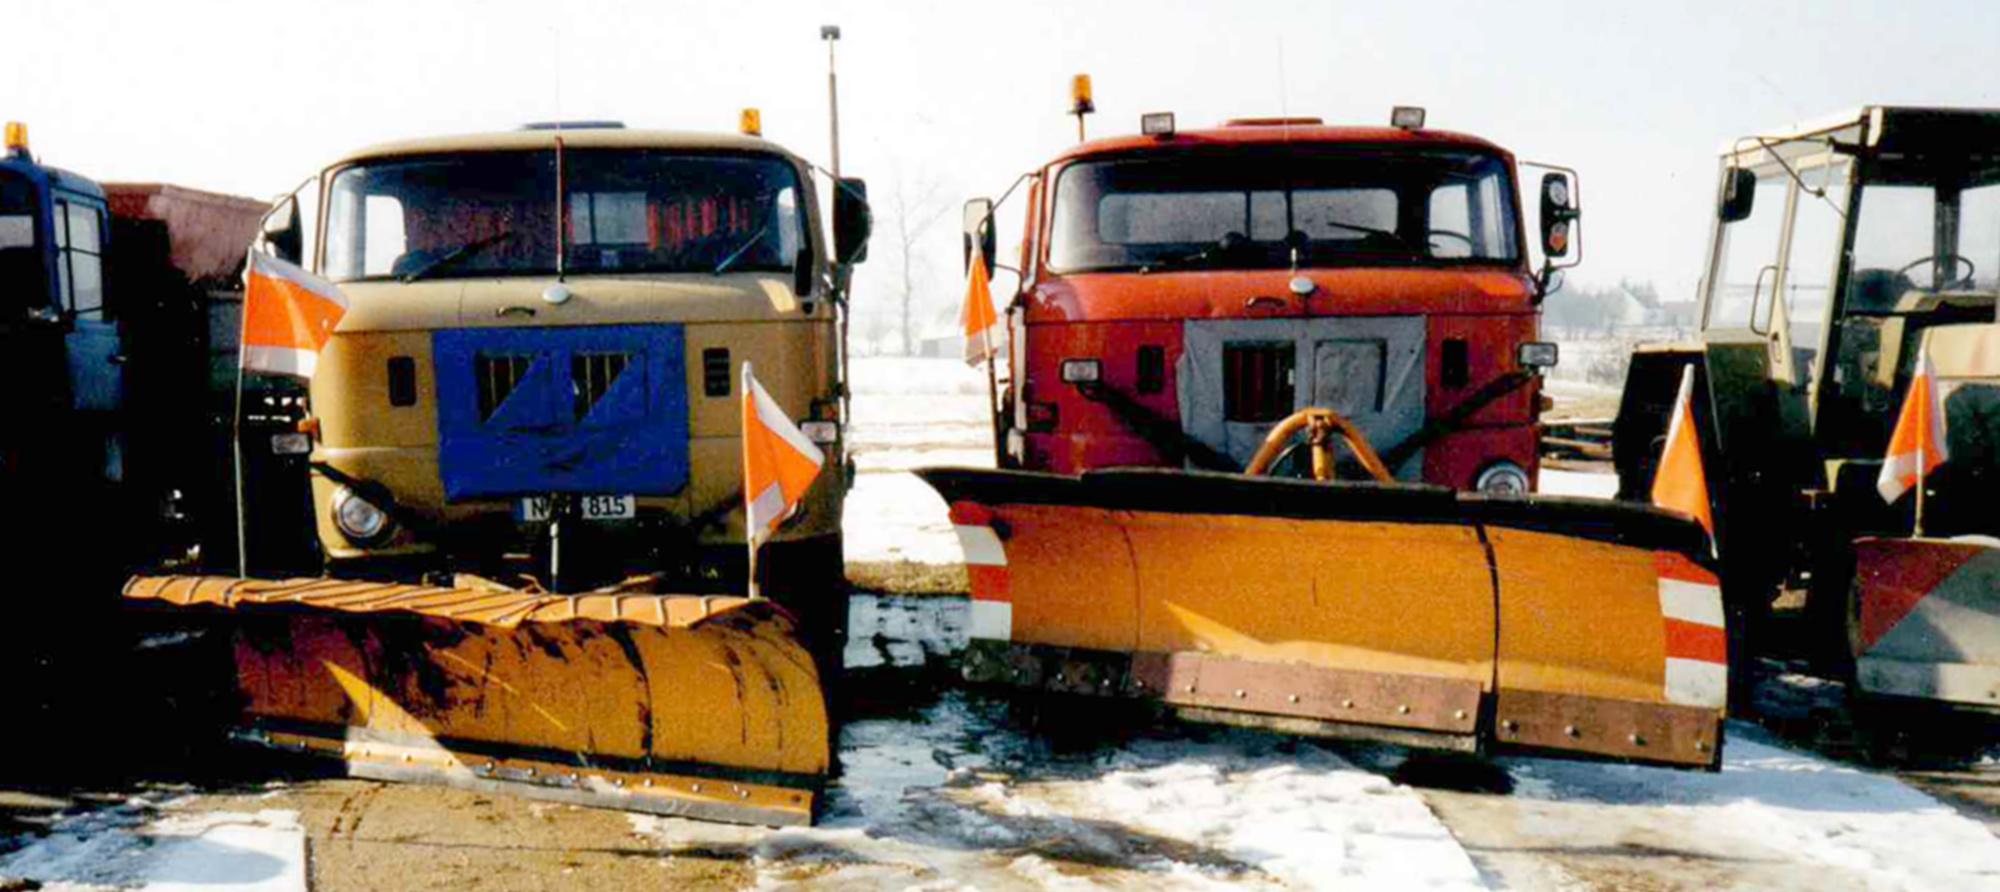 Wie alles begann - alte Flotte Rohloff Transport